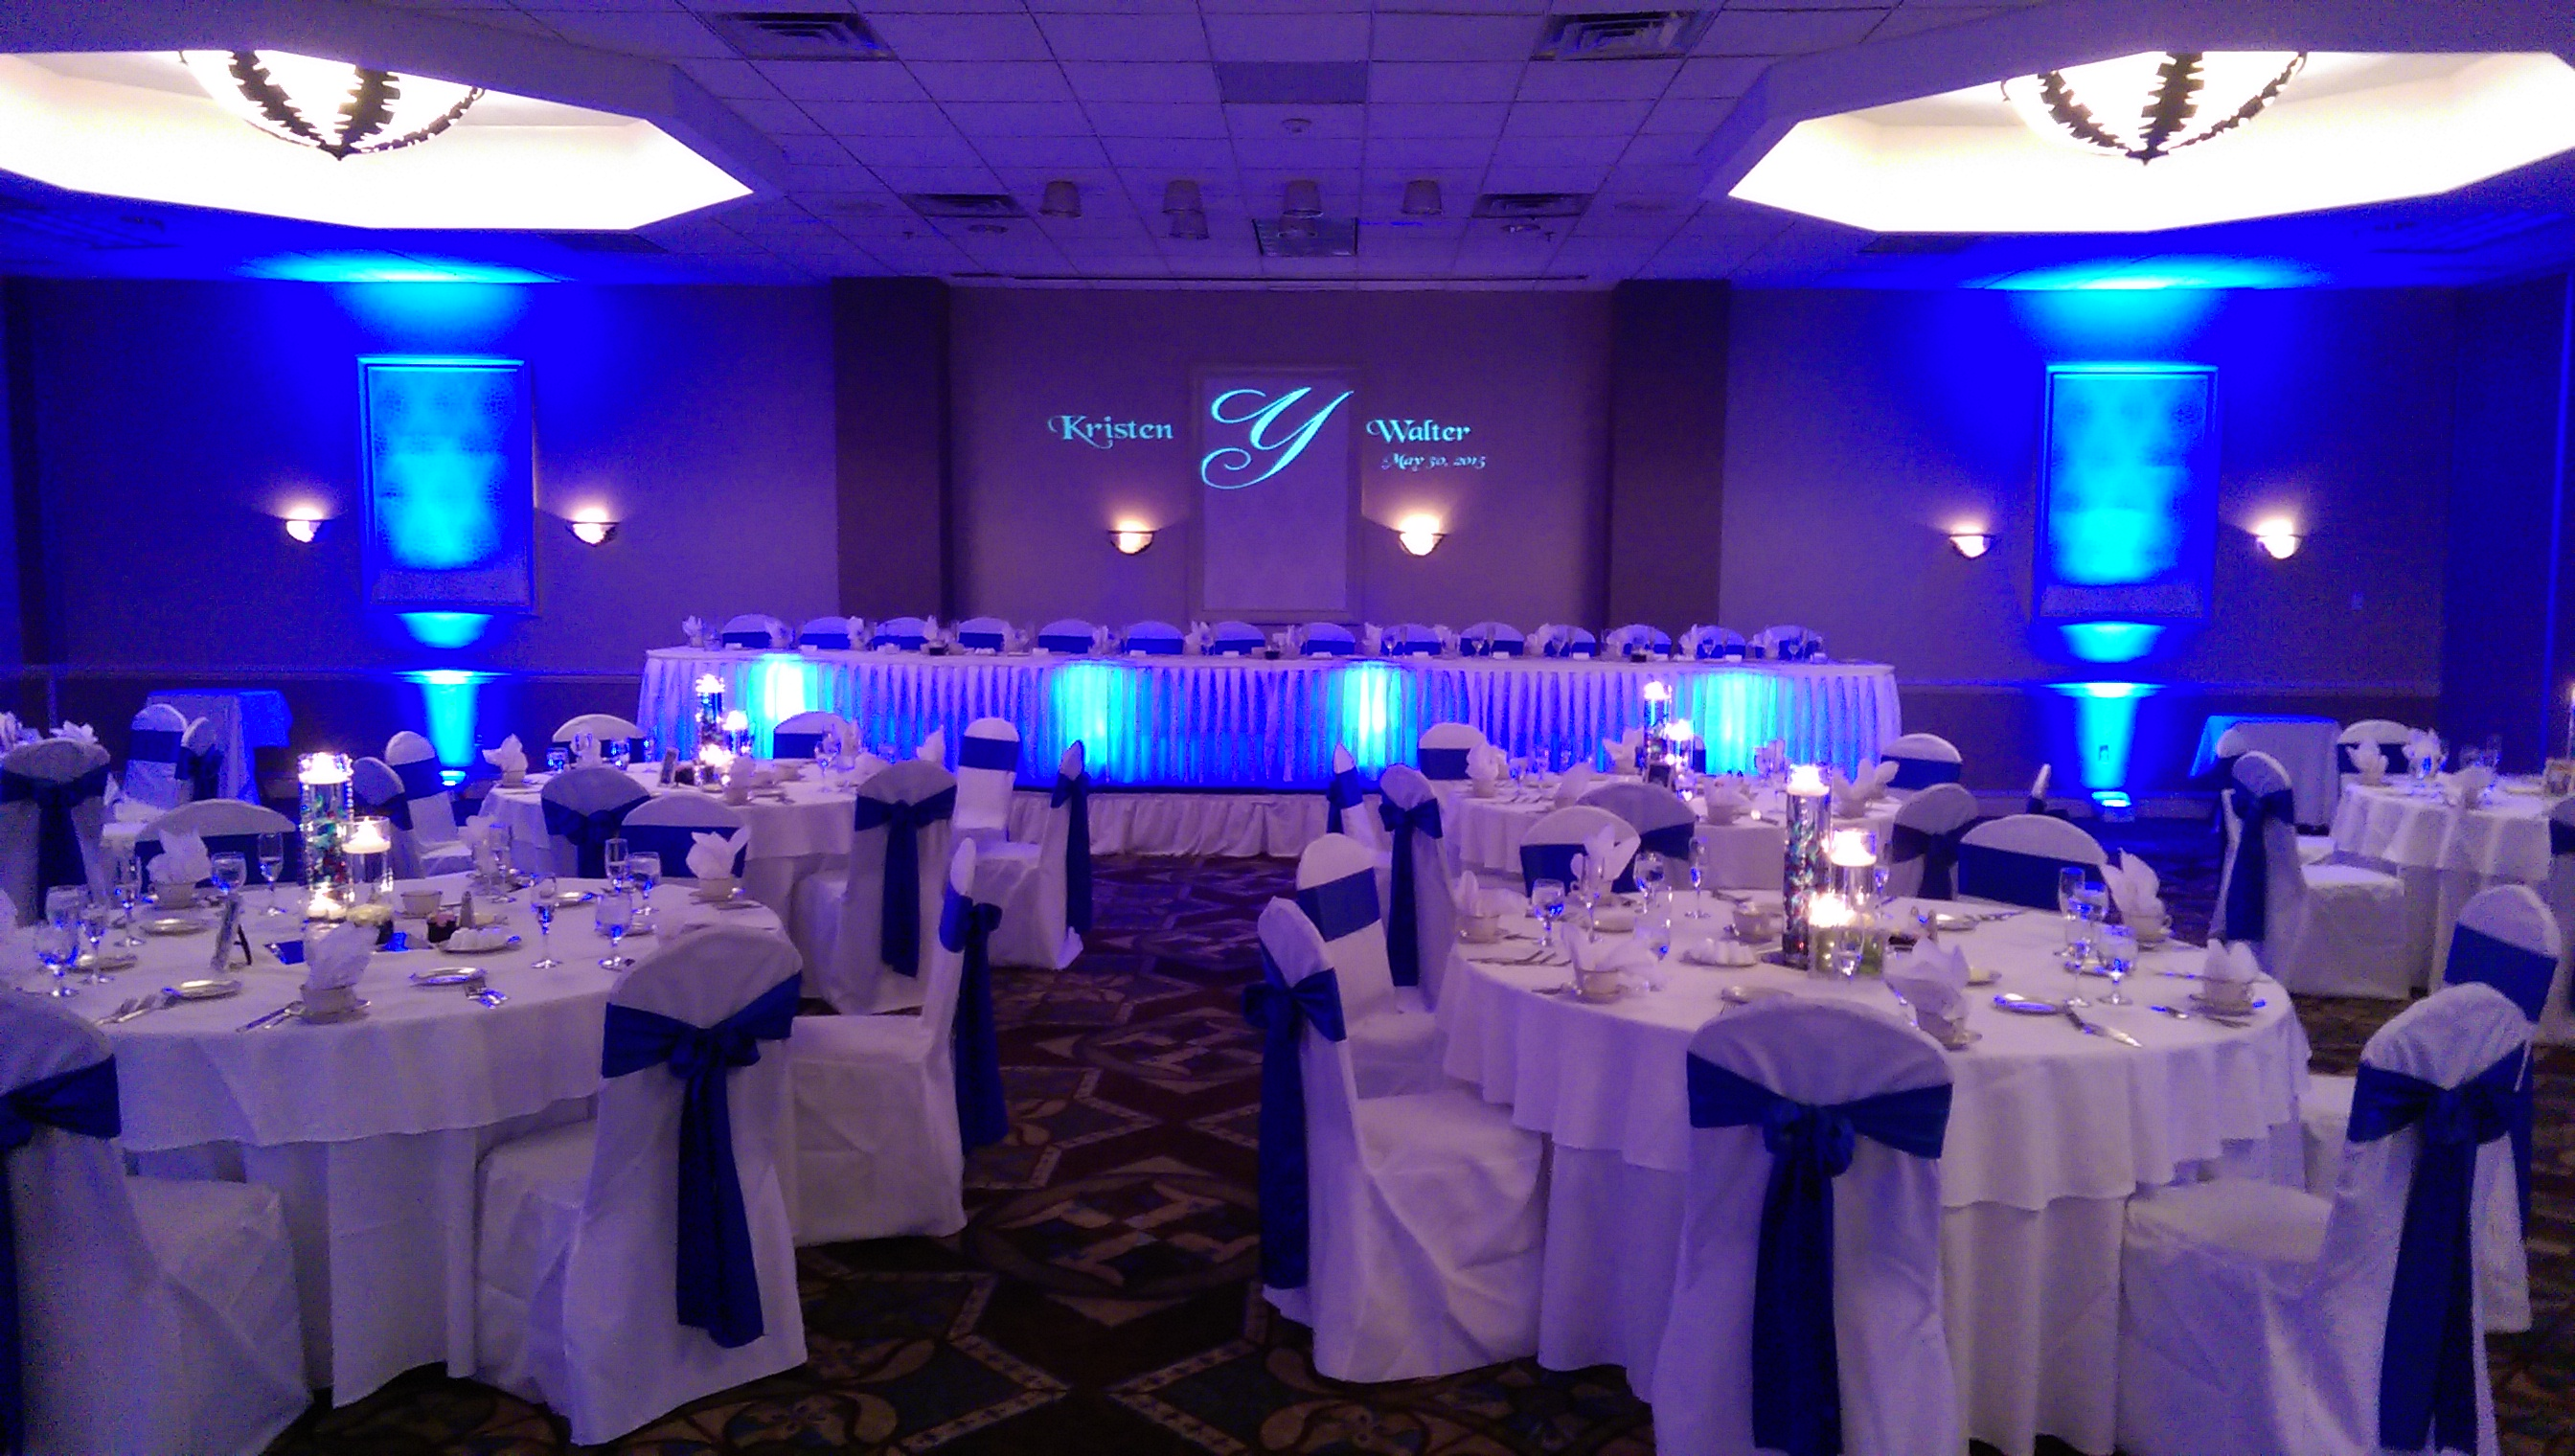 Holiday Inn Binghamton Wedding Reception With Uplights And Monogram